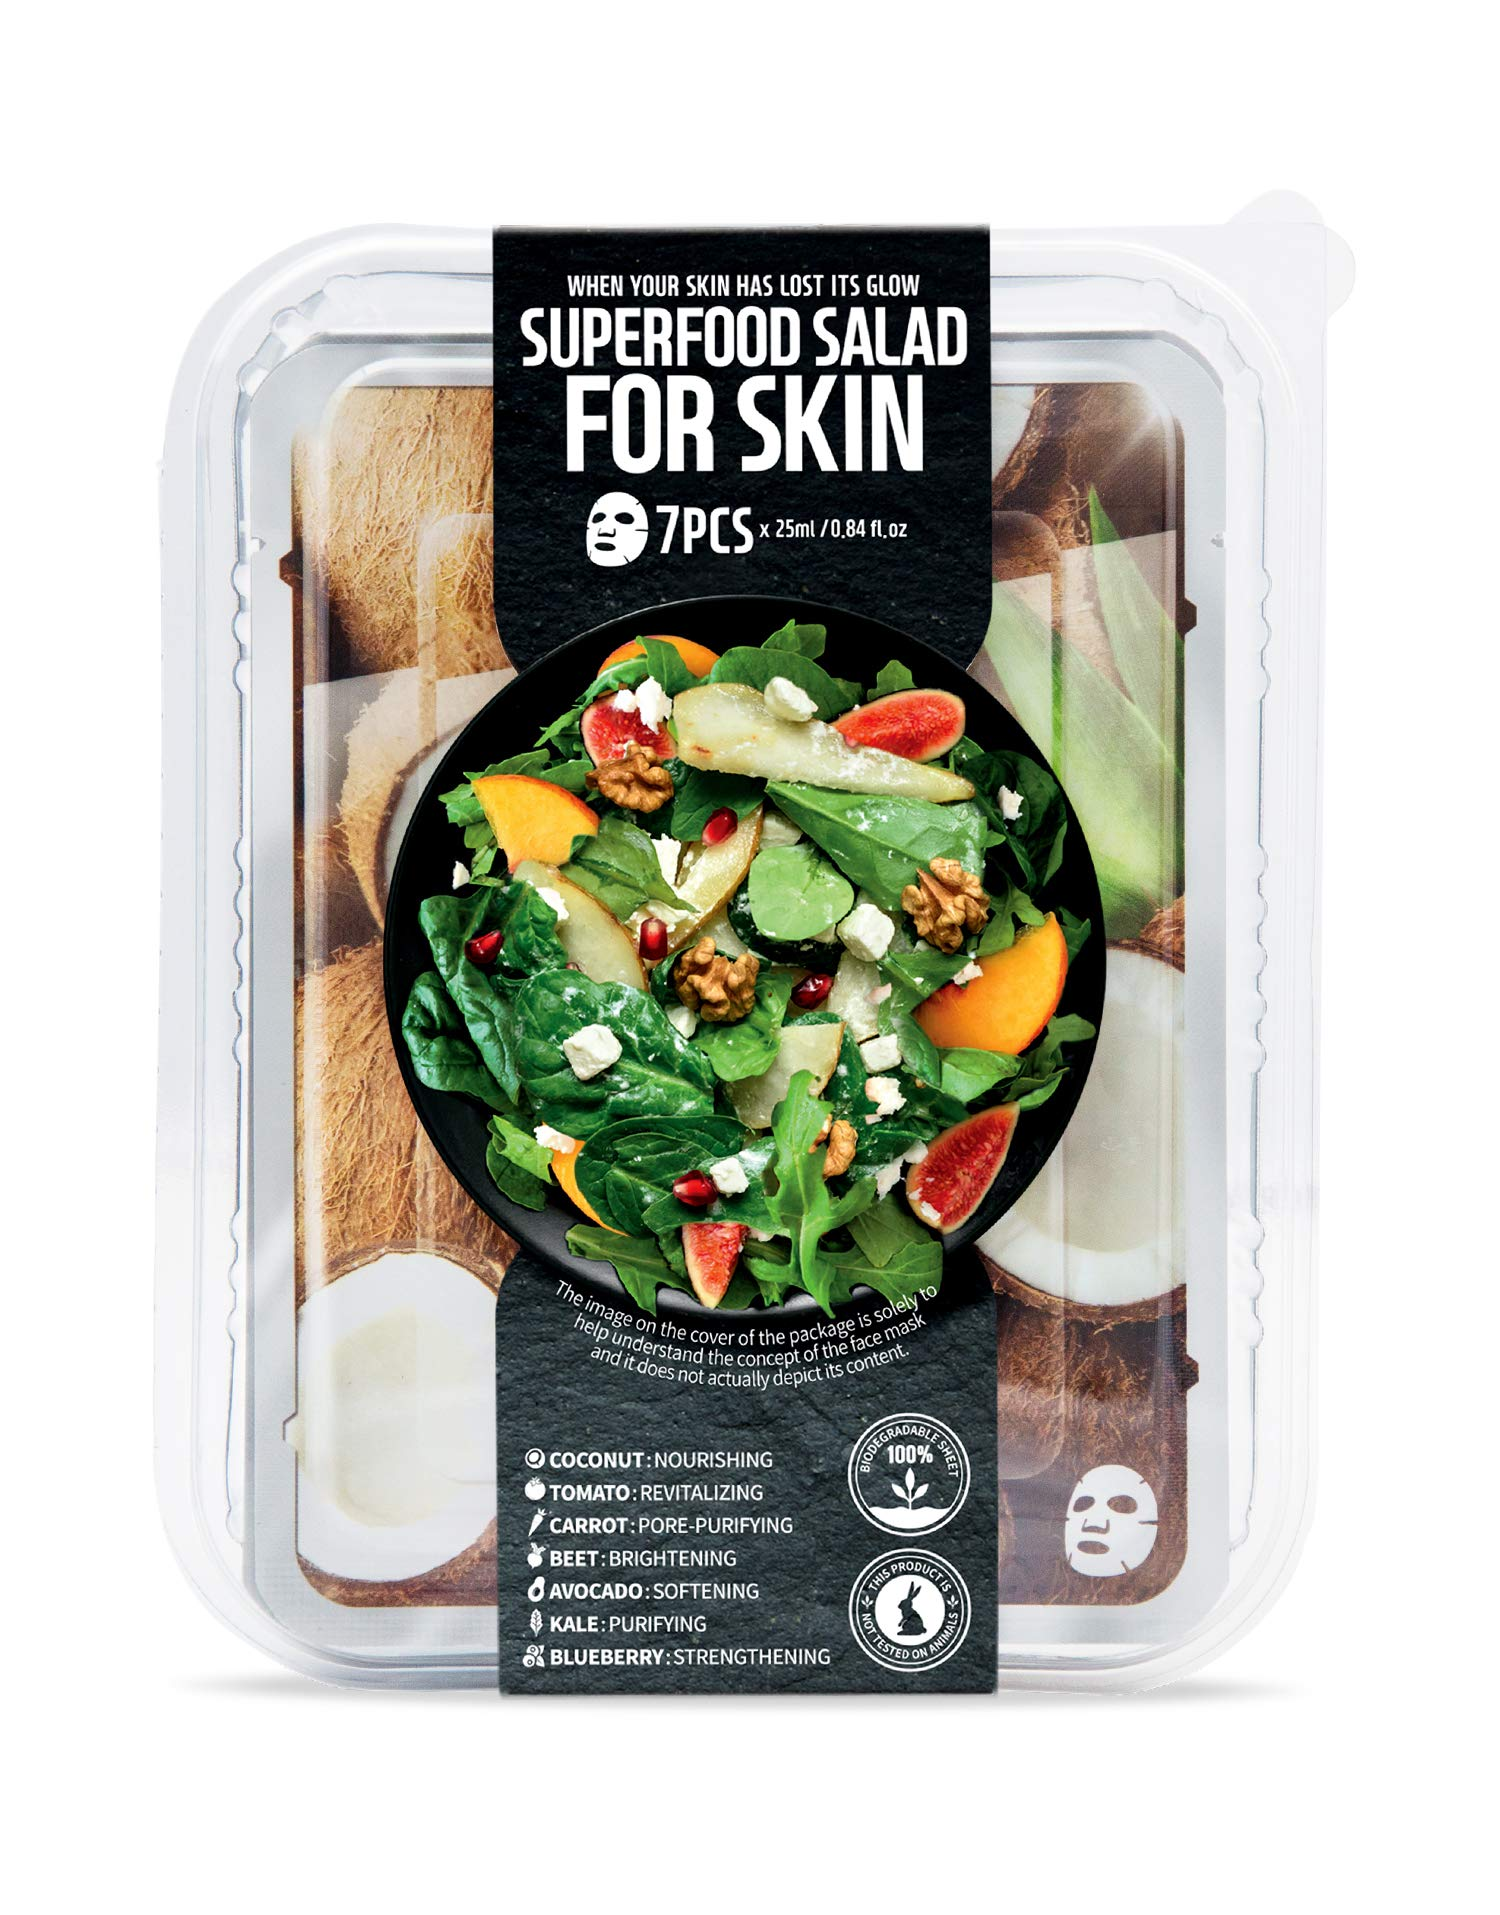 FARMSKIN Superfood Salad For Skin Beauty Facial Sheet Mask Coconut Salad Set (Pack of 7), Coconut